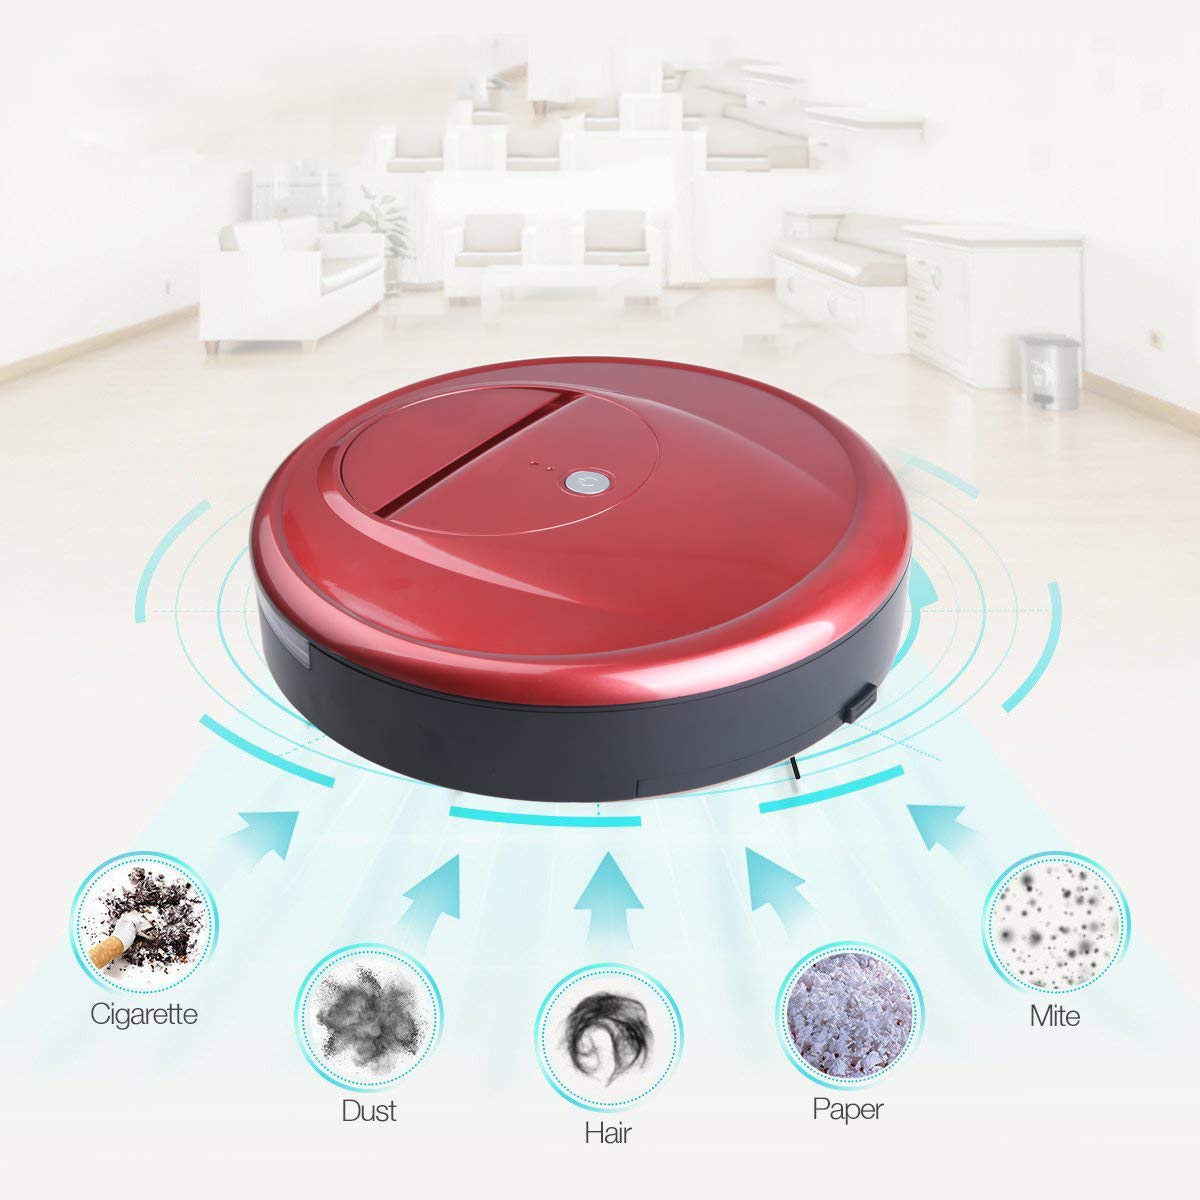 Robot aspirador automático inteligente limpiador balayer alfombra piso regalo rojo